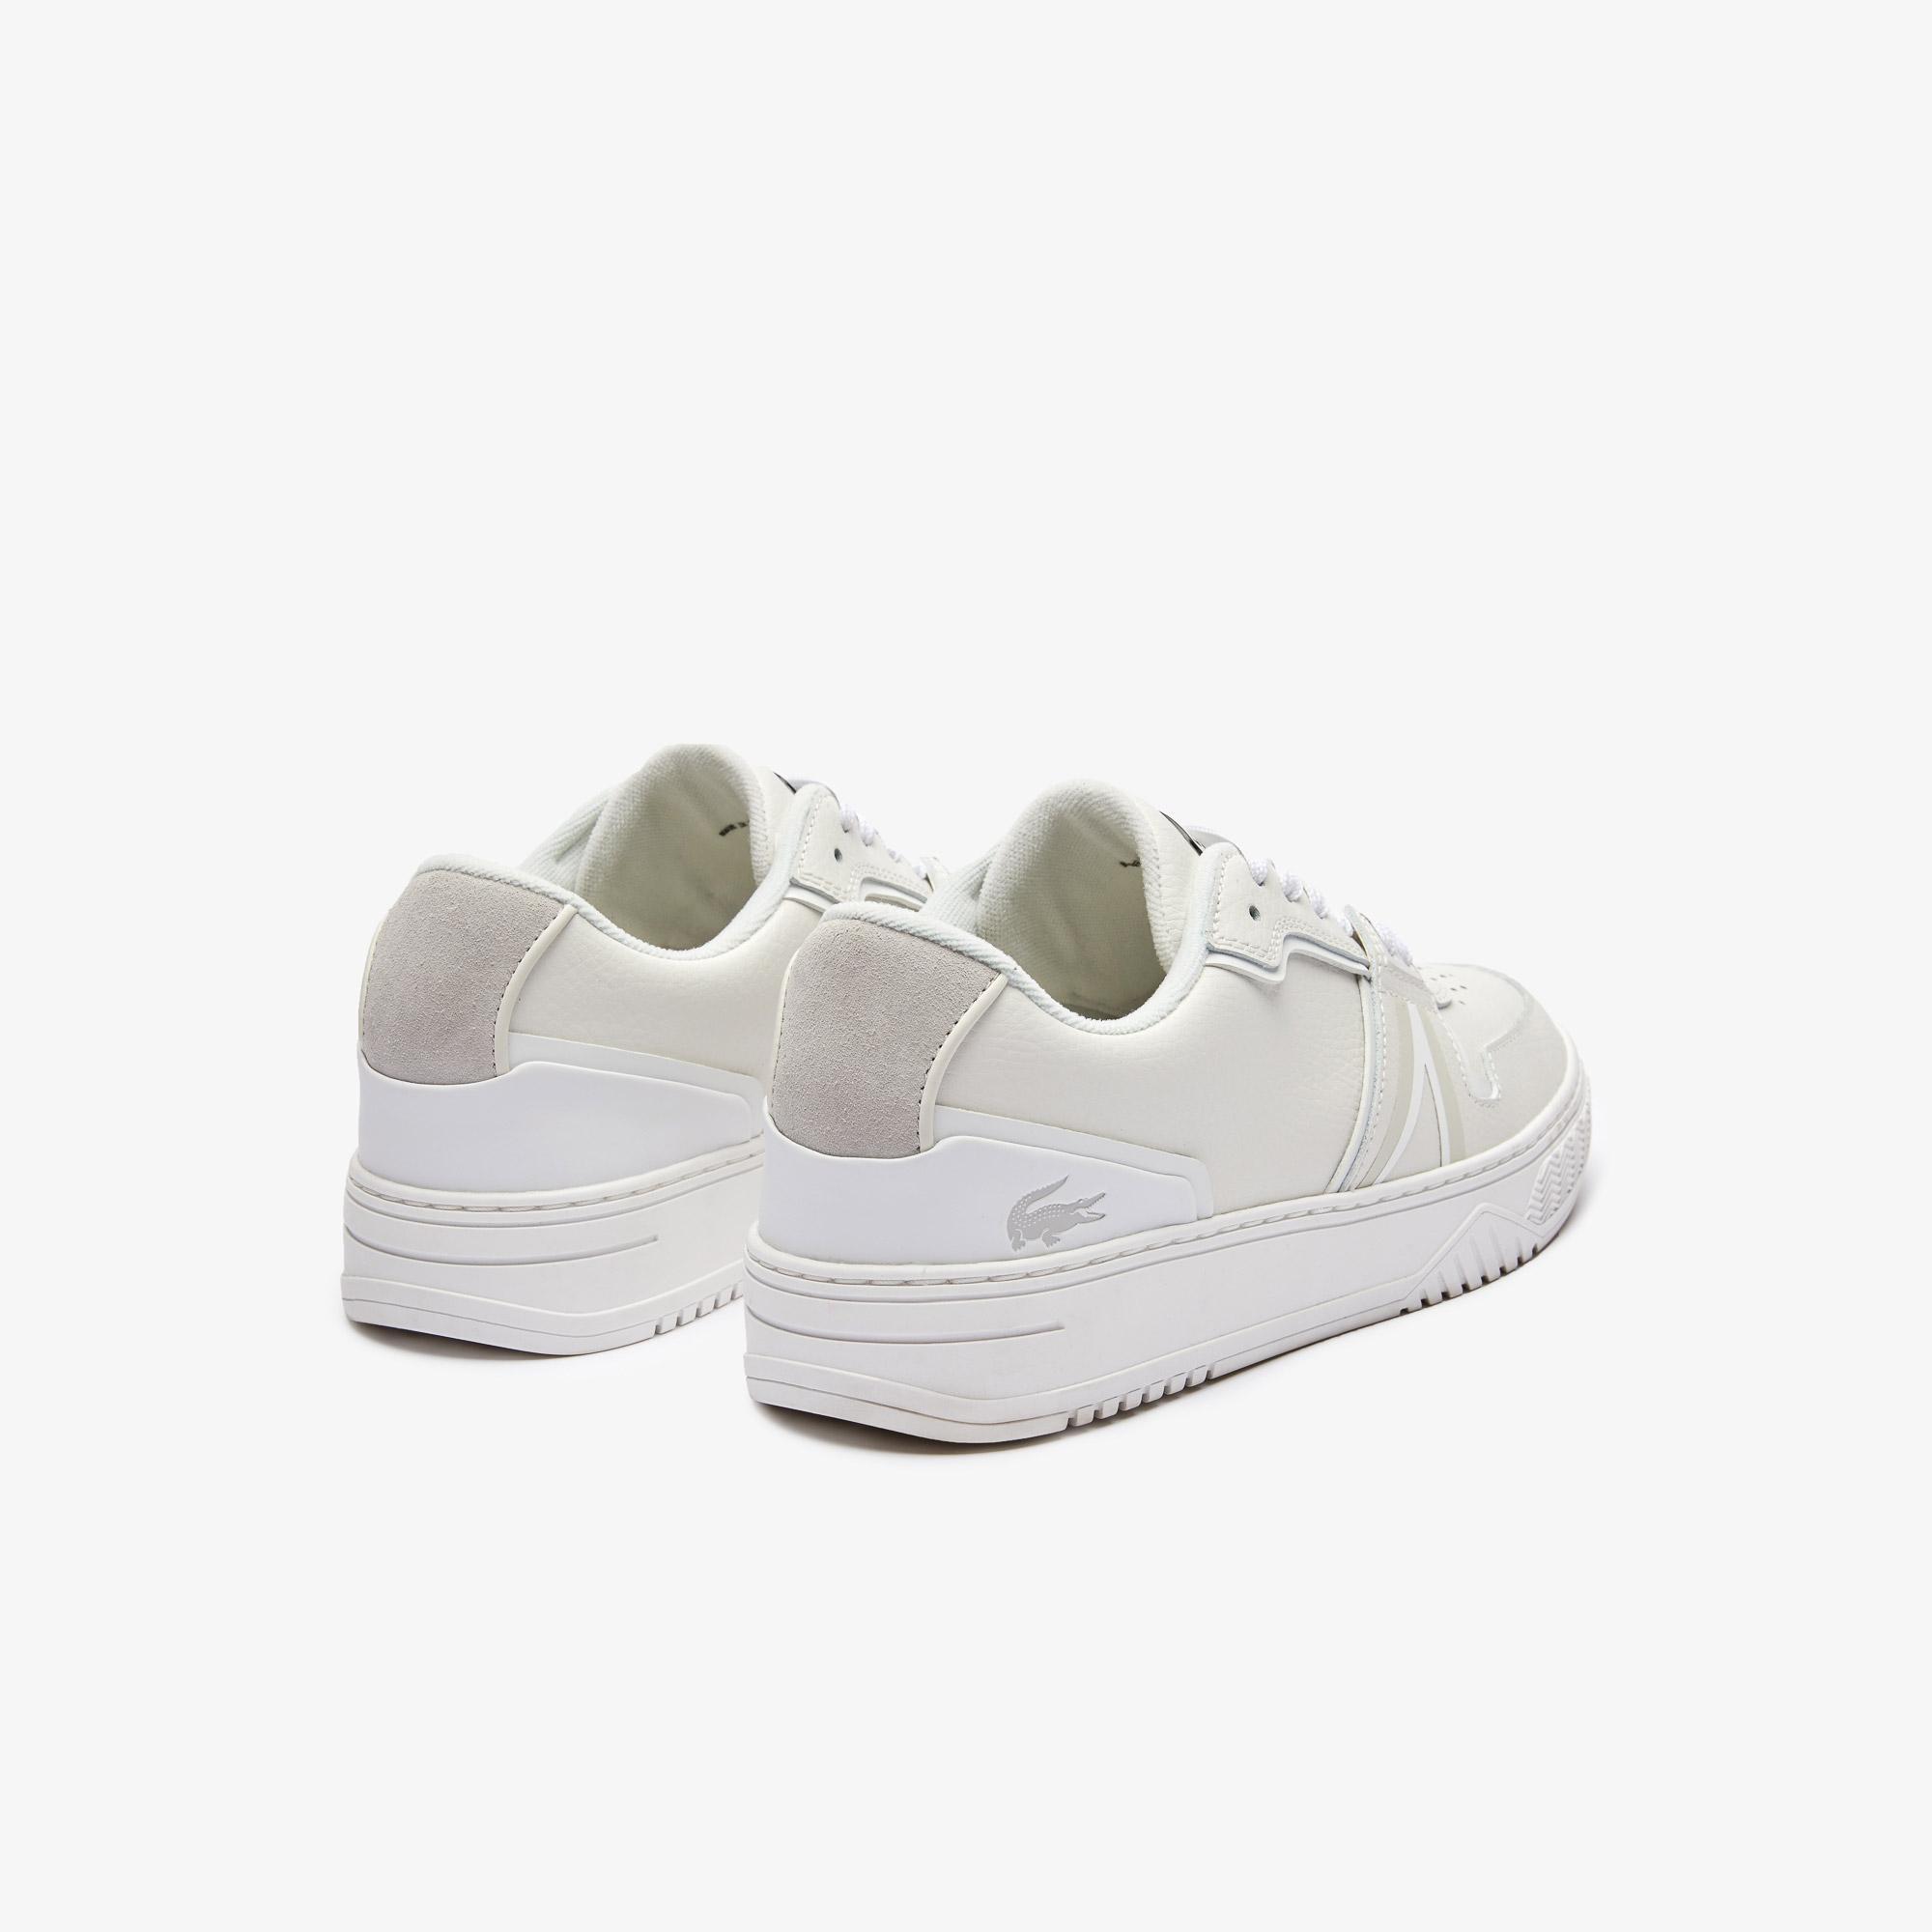 Lacoste Men's L001 Leather Sneakers